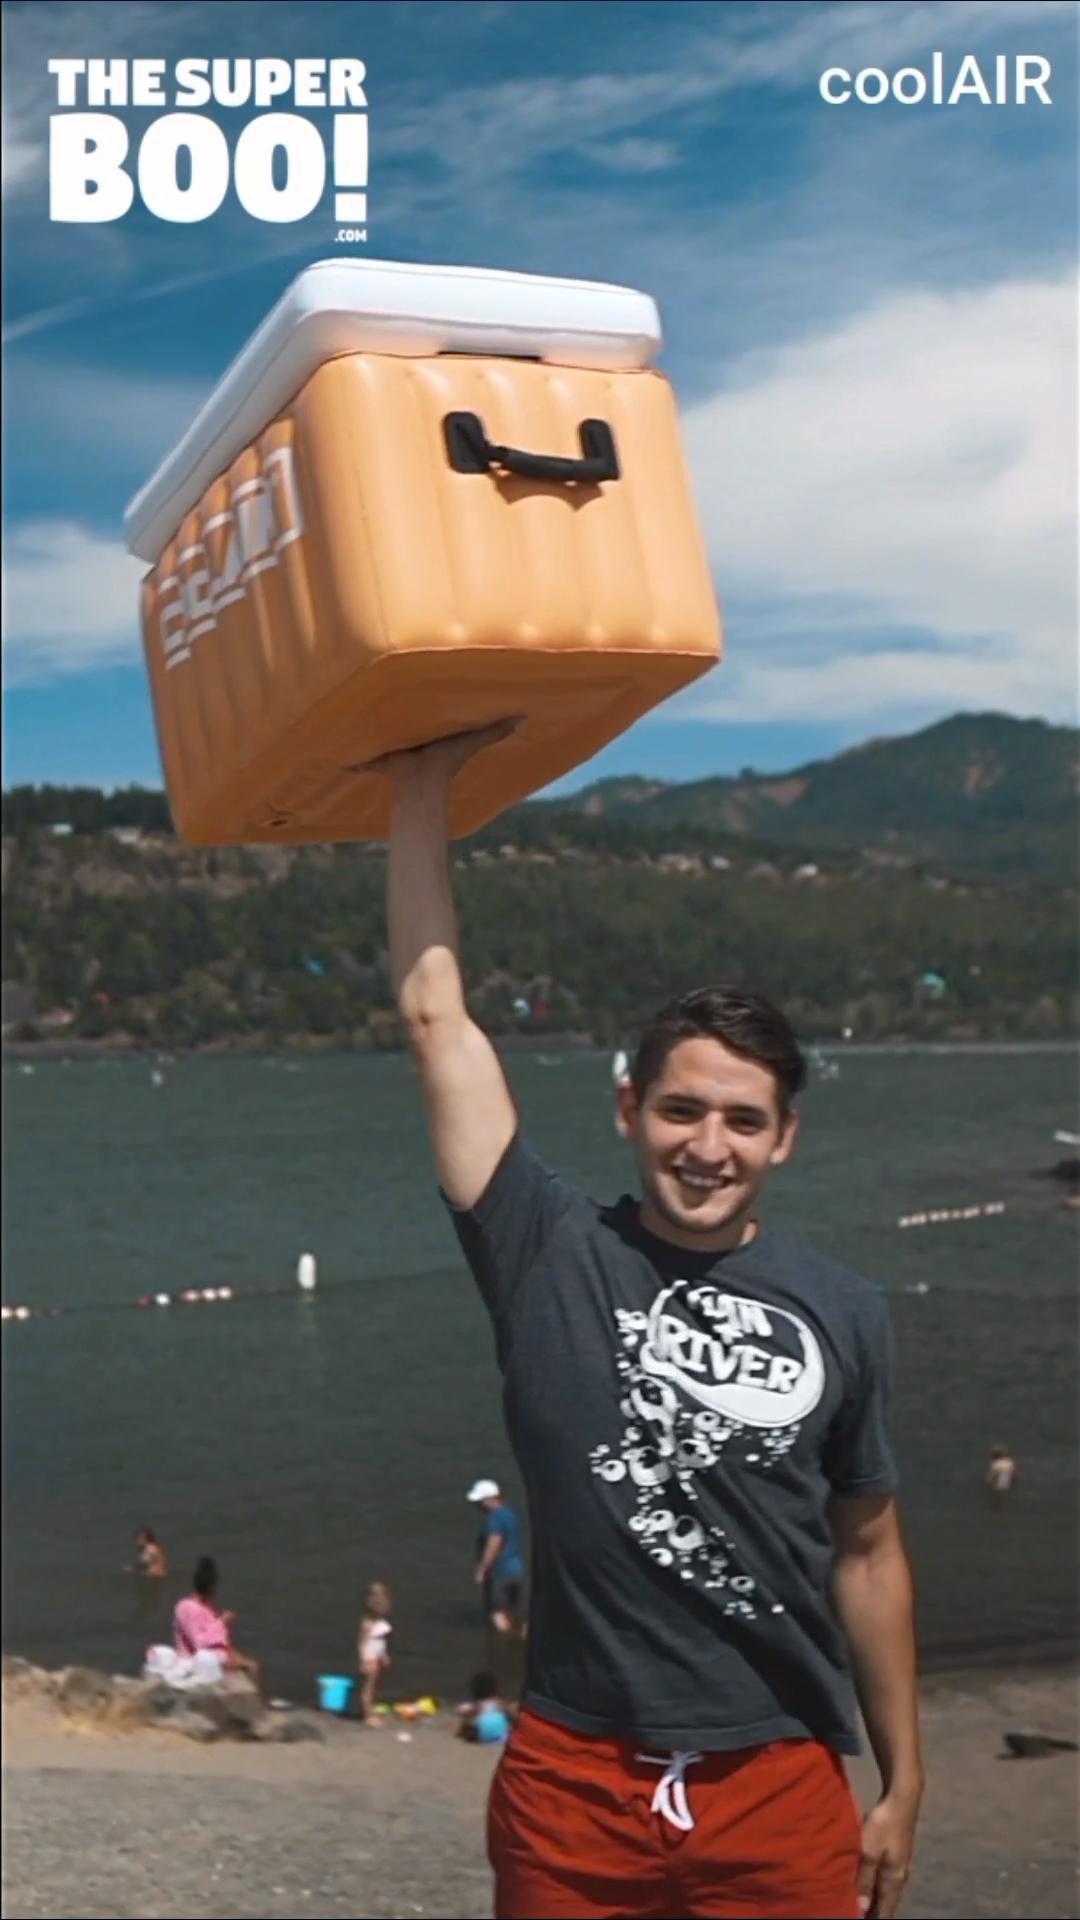 Floating Inflatable Drink Cooler